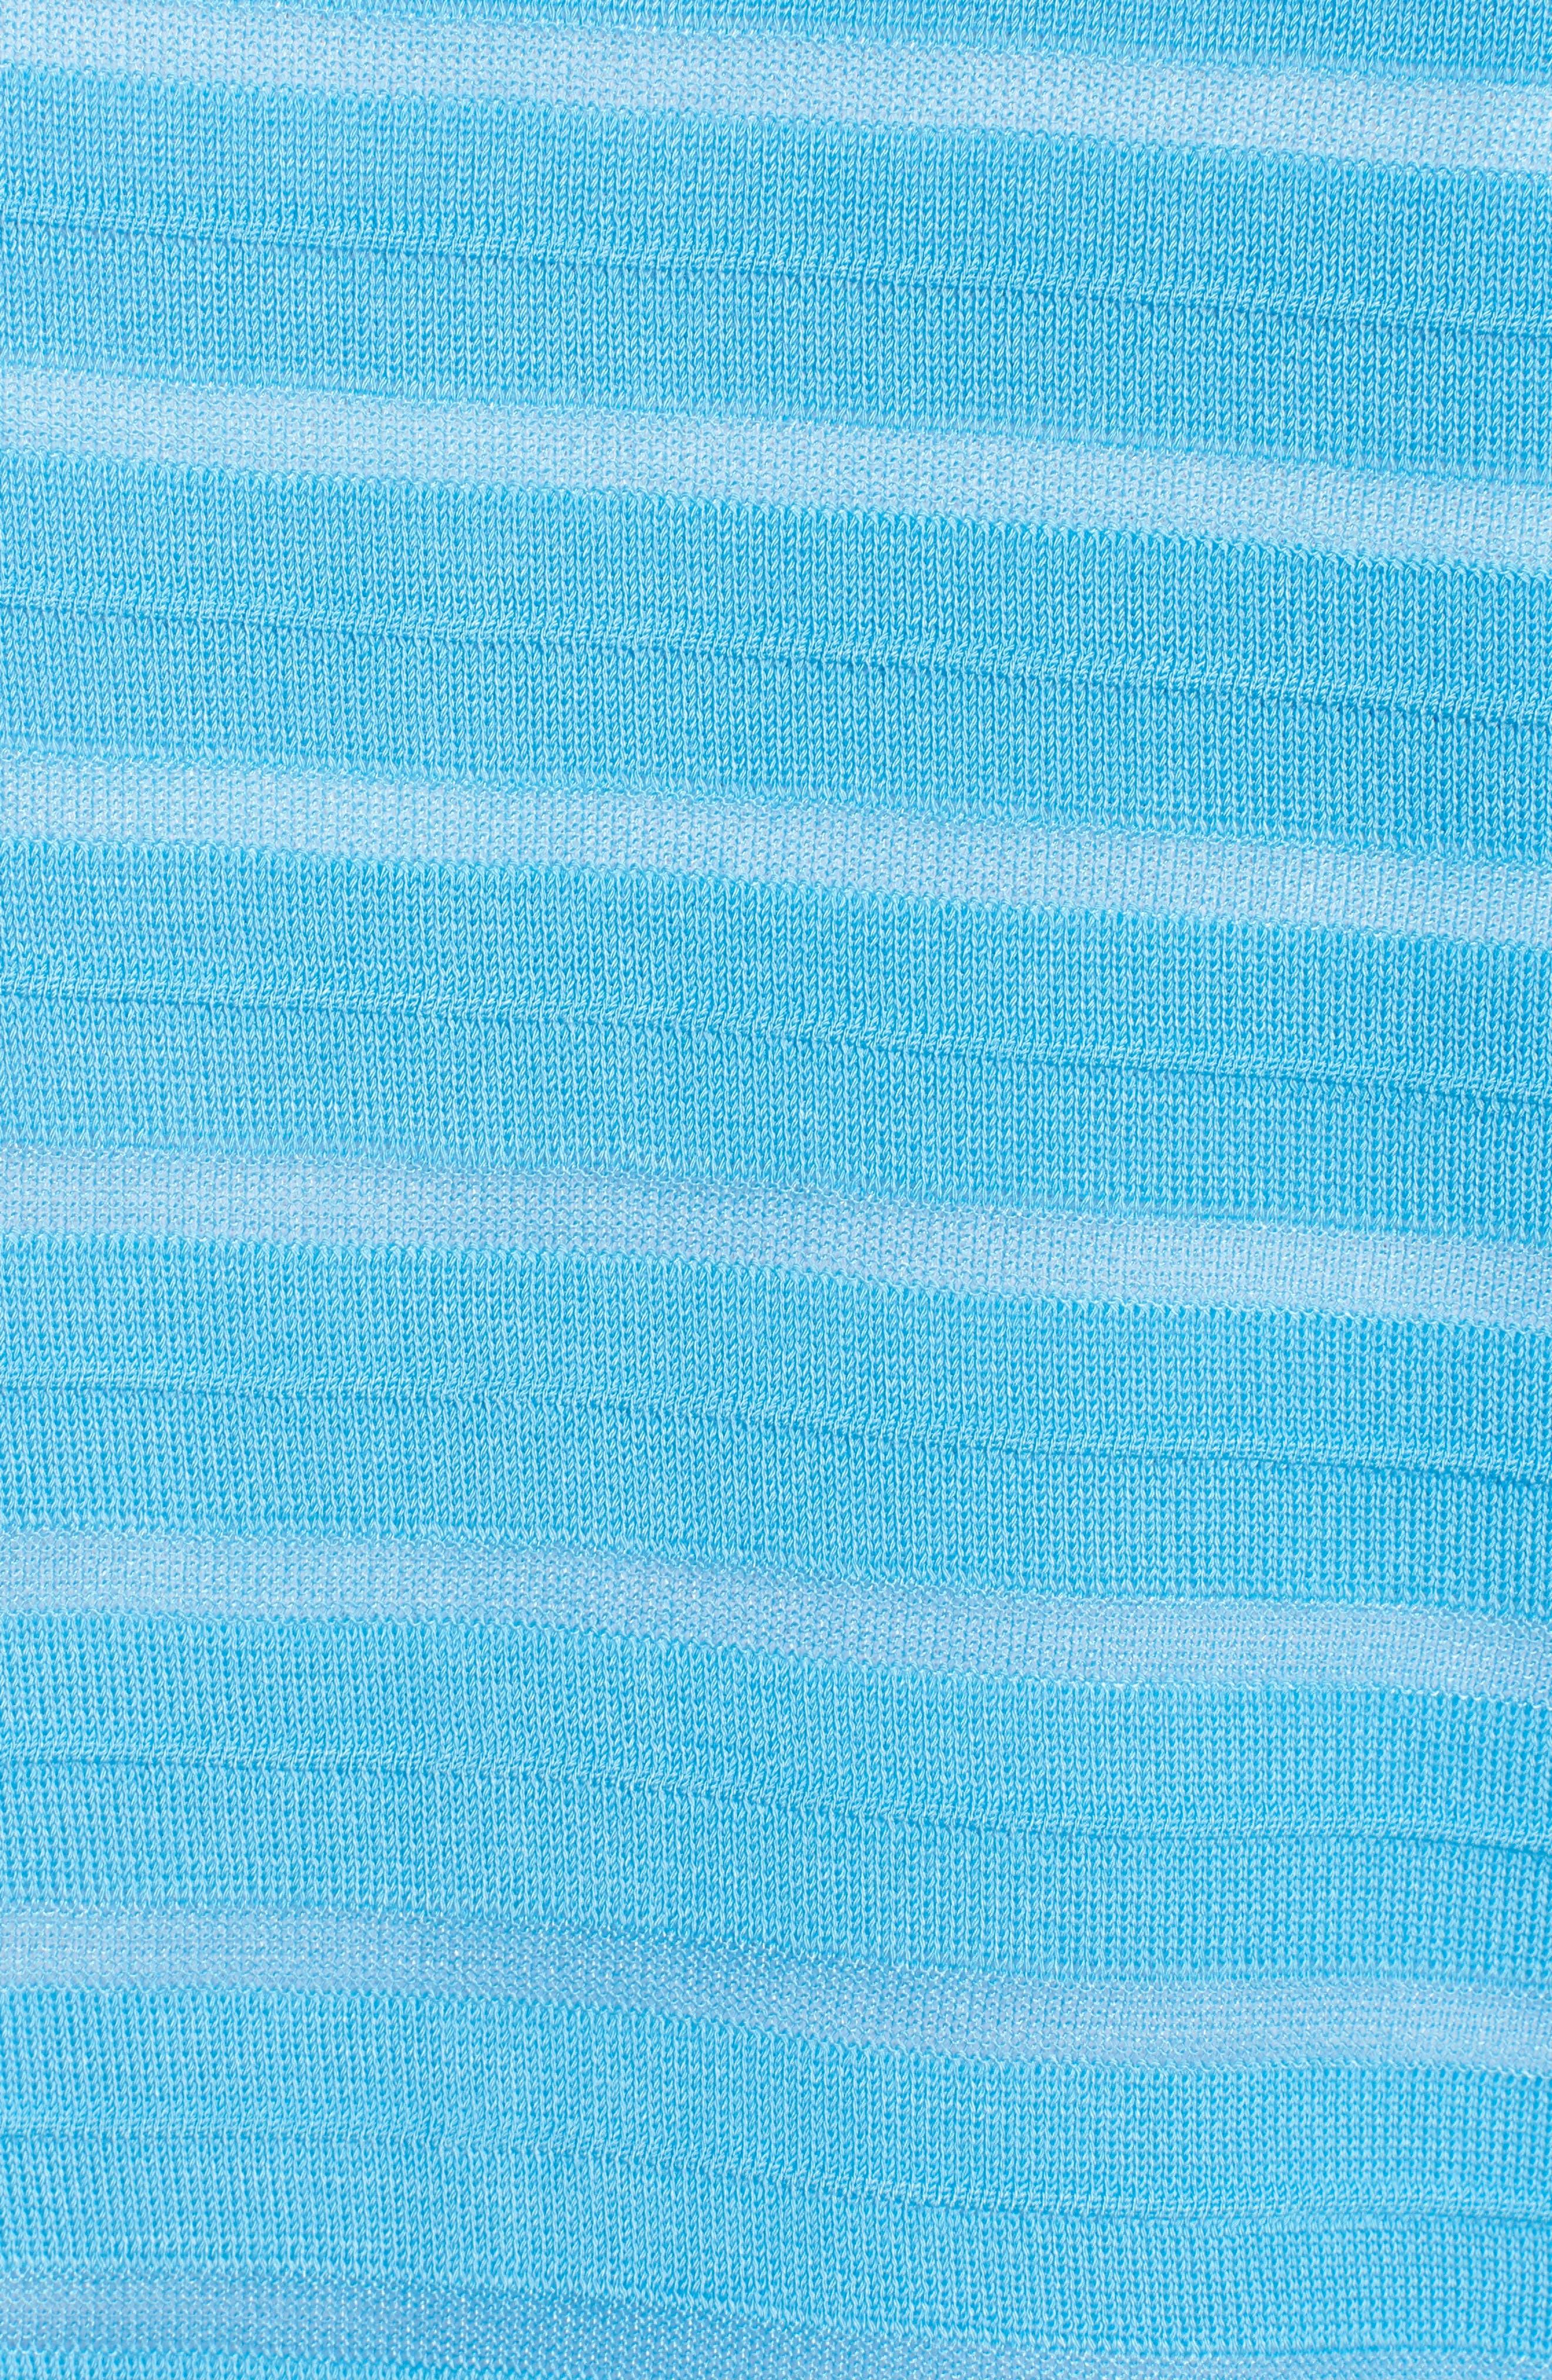 Sheer Stripe Long Jacket,                             Alternate thumbnail 6, color,                             BLUEBONNET/ BLACK